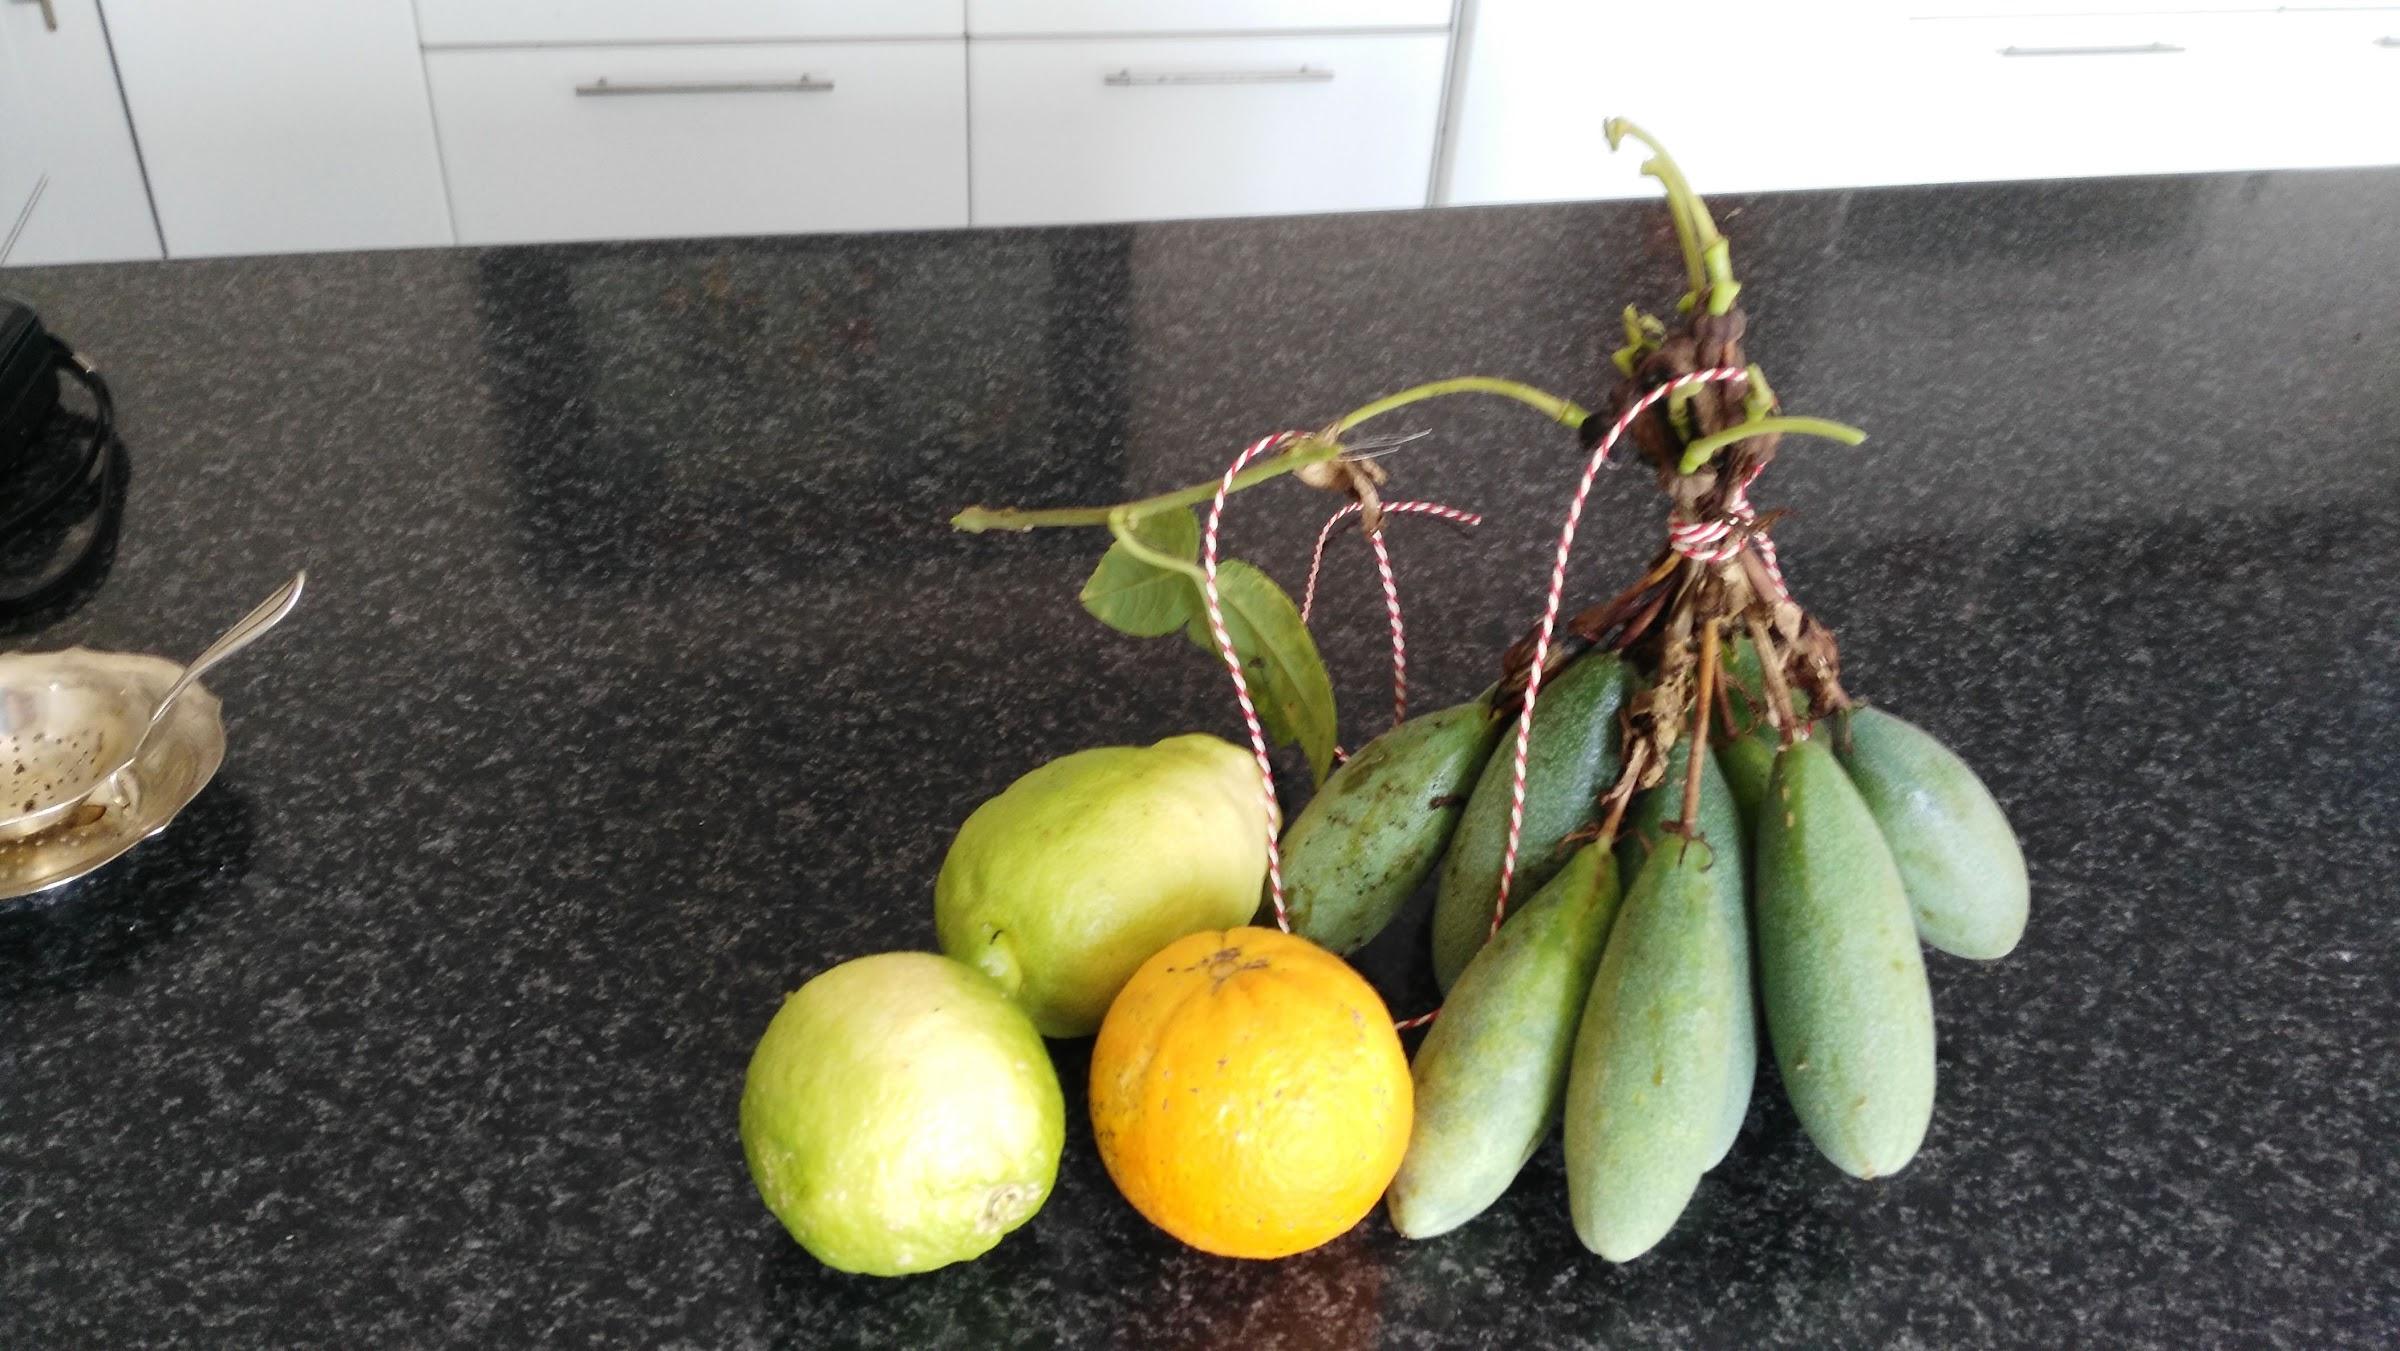 De tuin draagt vrucht!